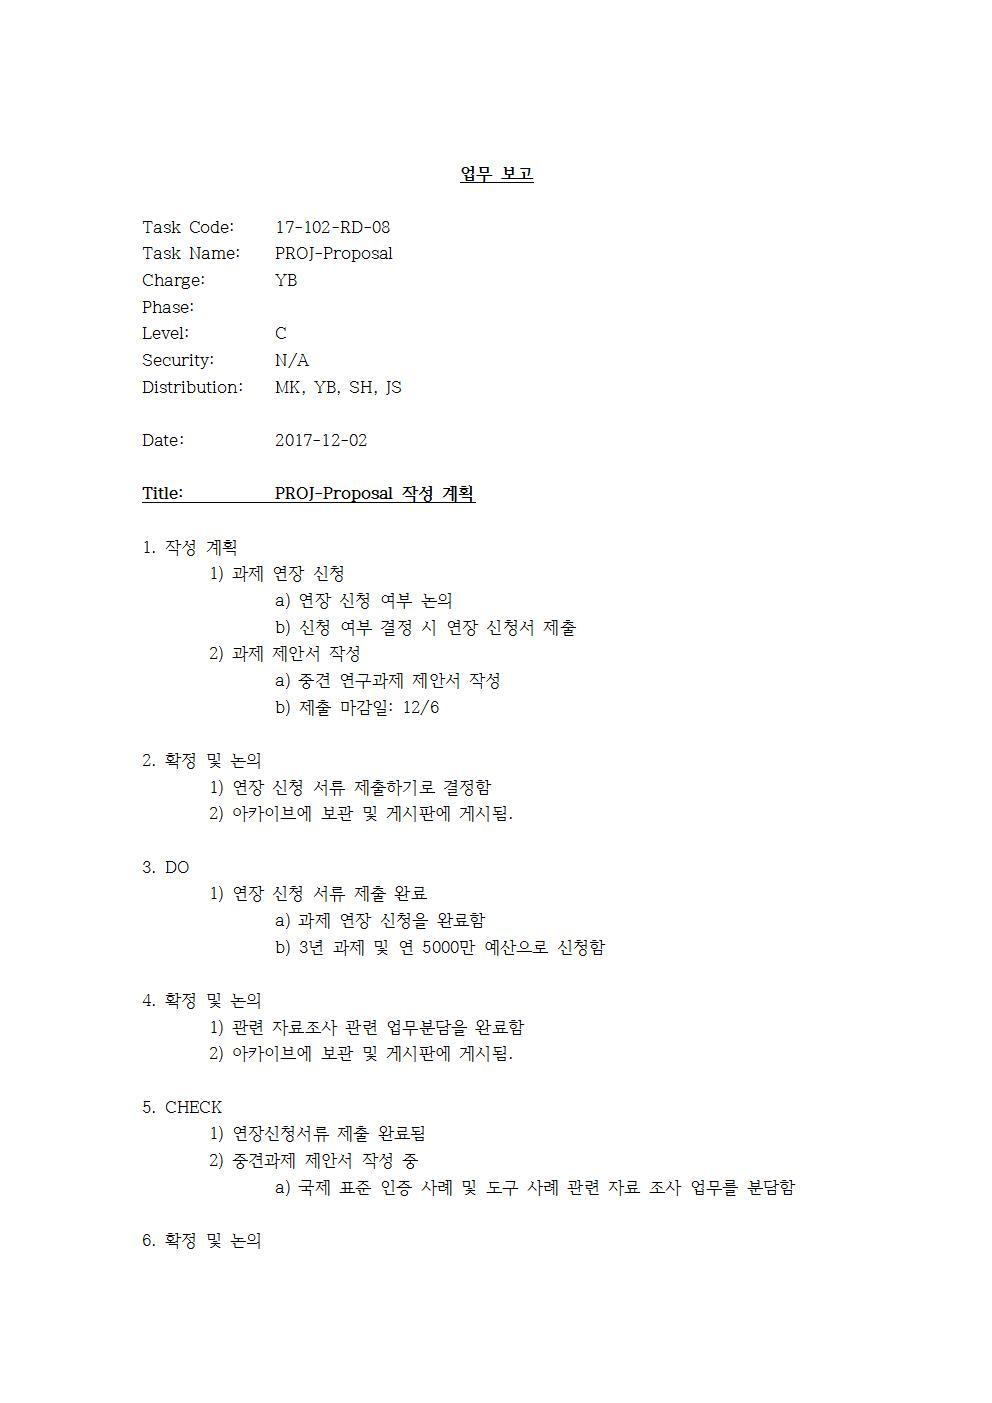 D-[17-102-RD-08]-[PROJ-Proposal]-[YB]-[2017-12-02]001.jpg